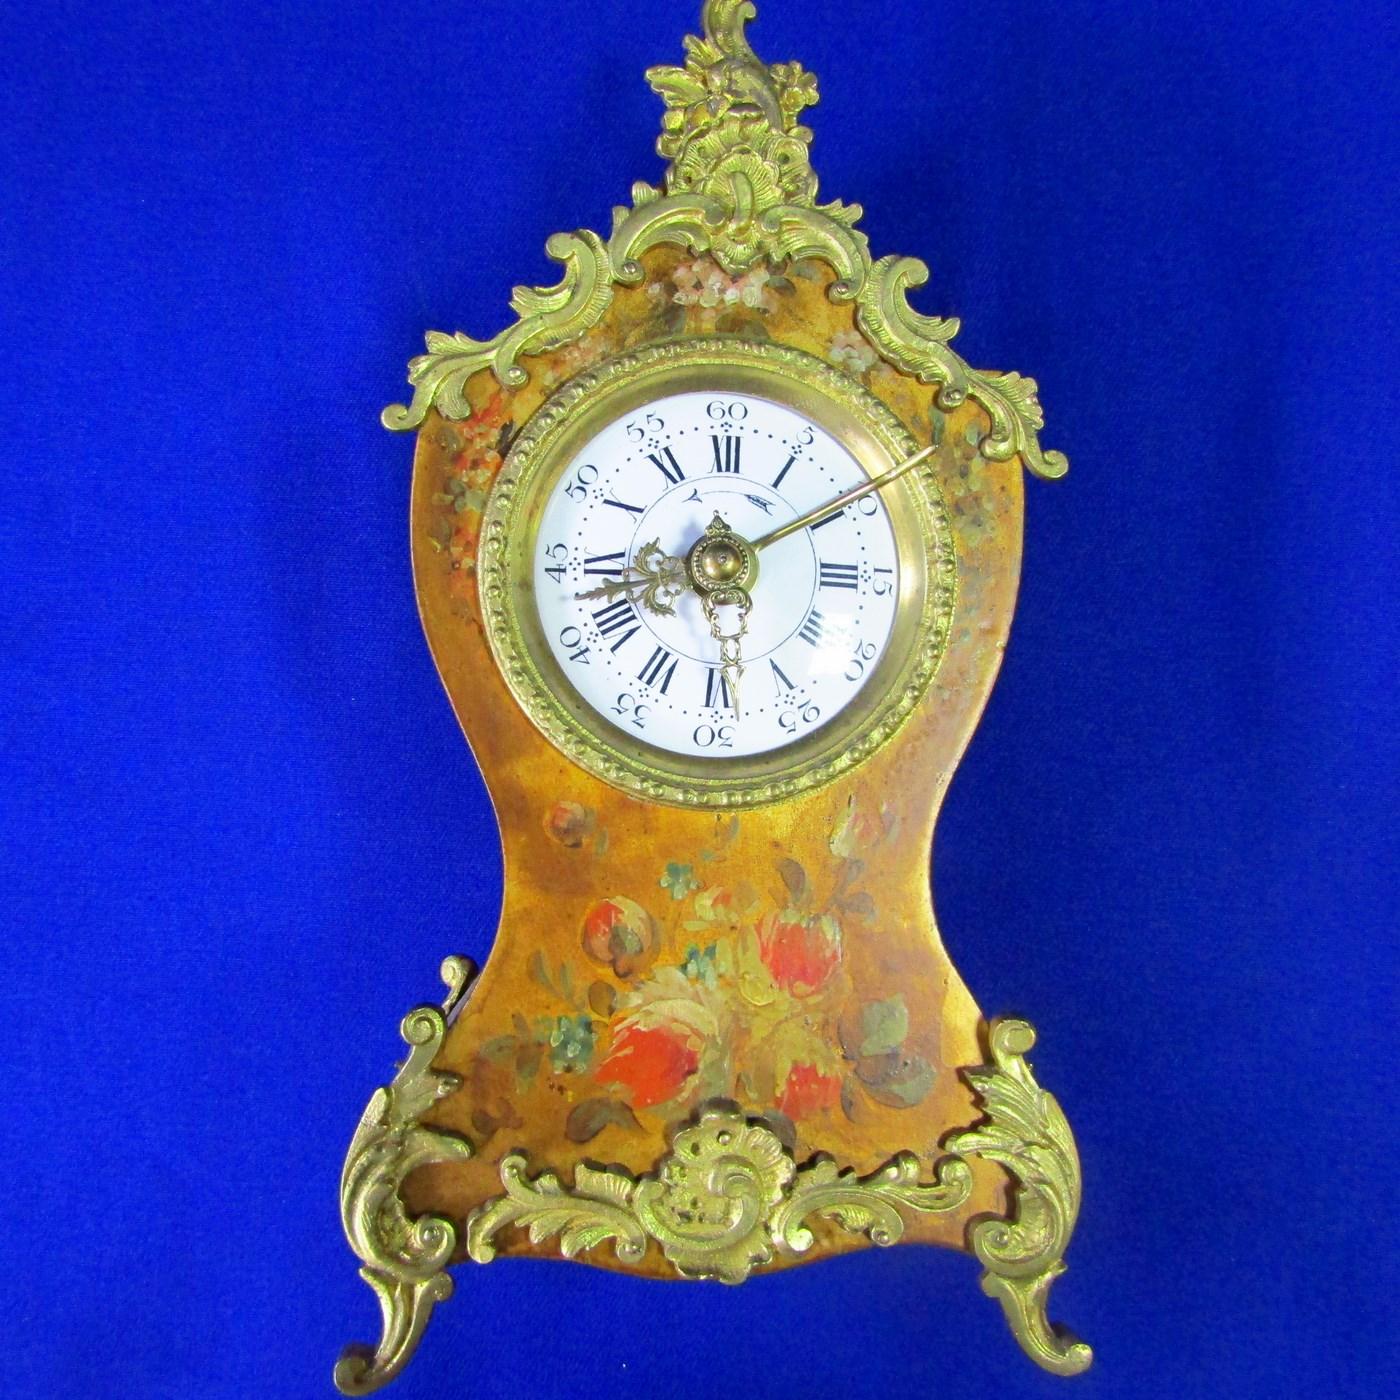 Reloj de Sobremesa, tipo Capilla, con carrillón, en madera y bronce.